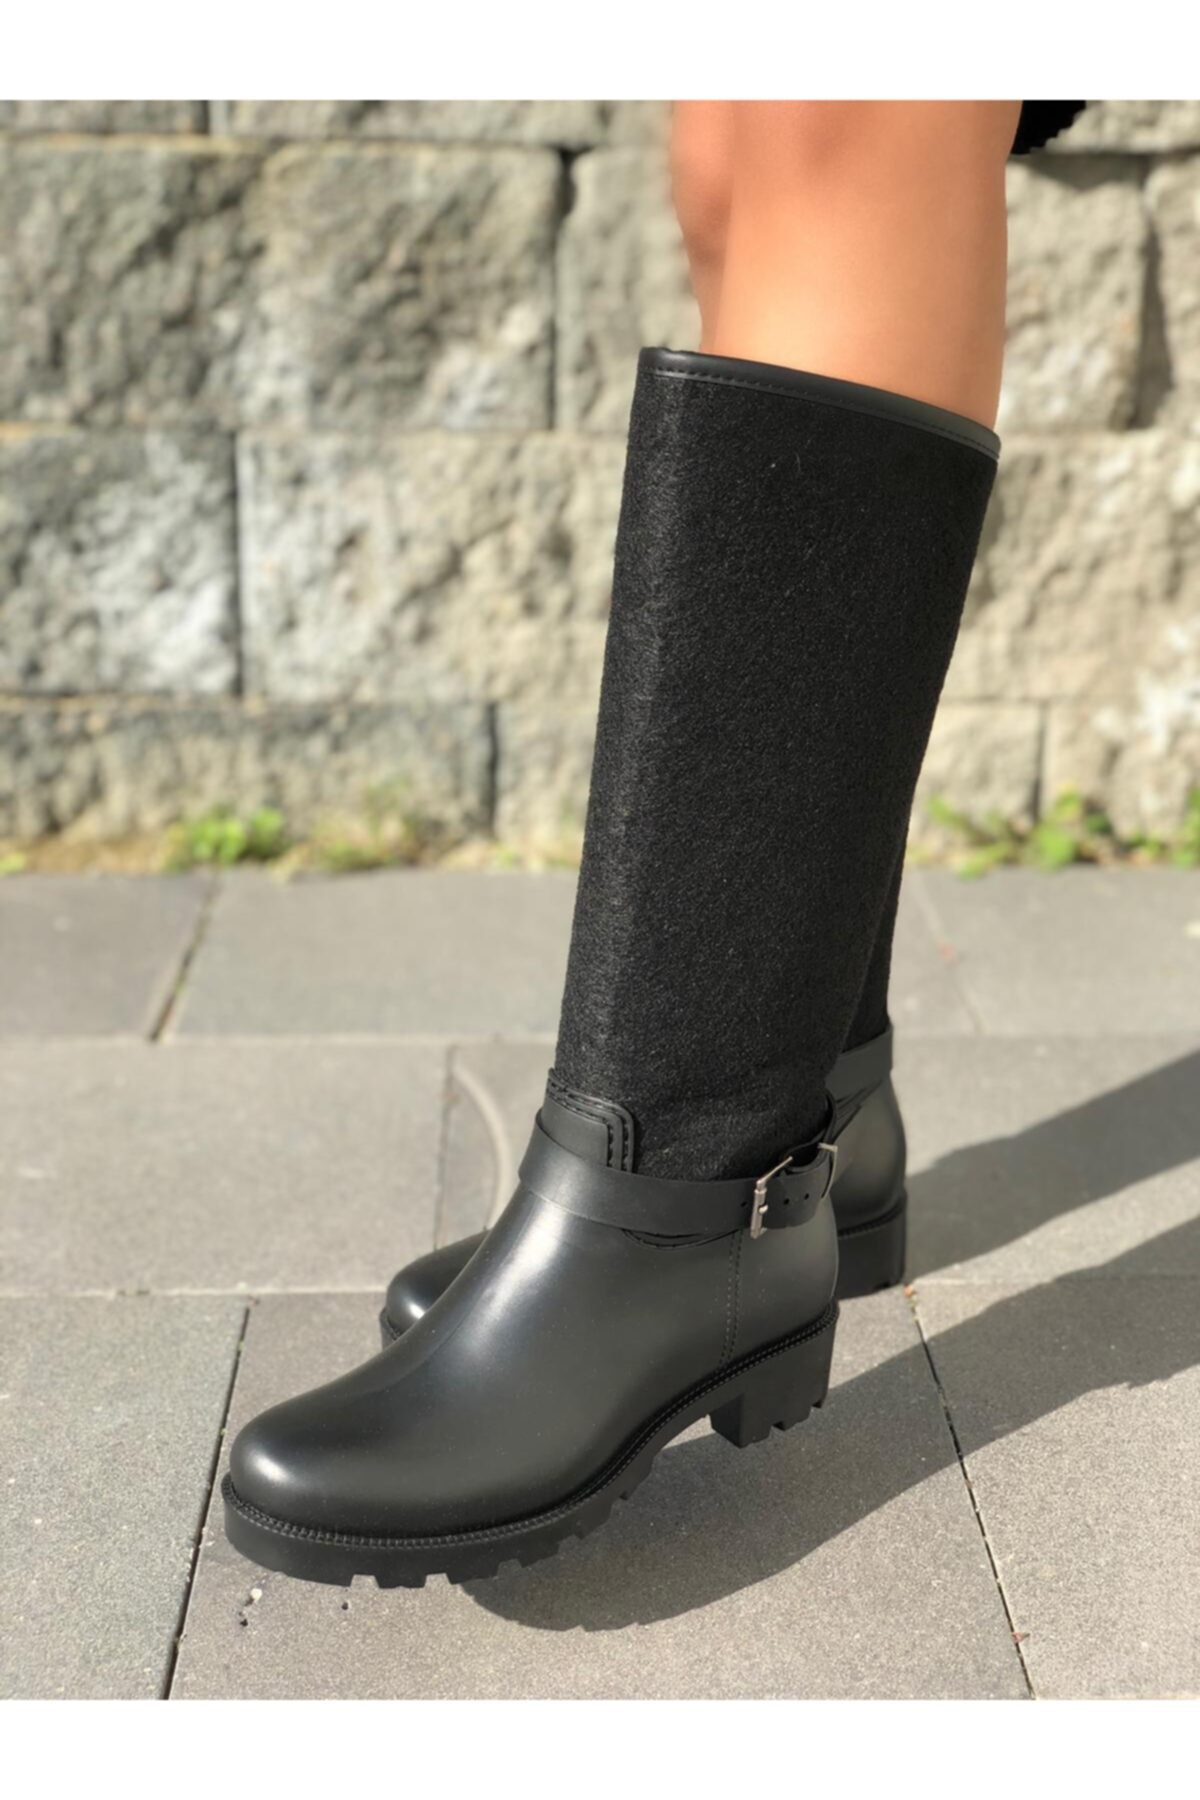 wolk shoes Kadın Siyah Kaşe Yagmur Cizmesi 2